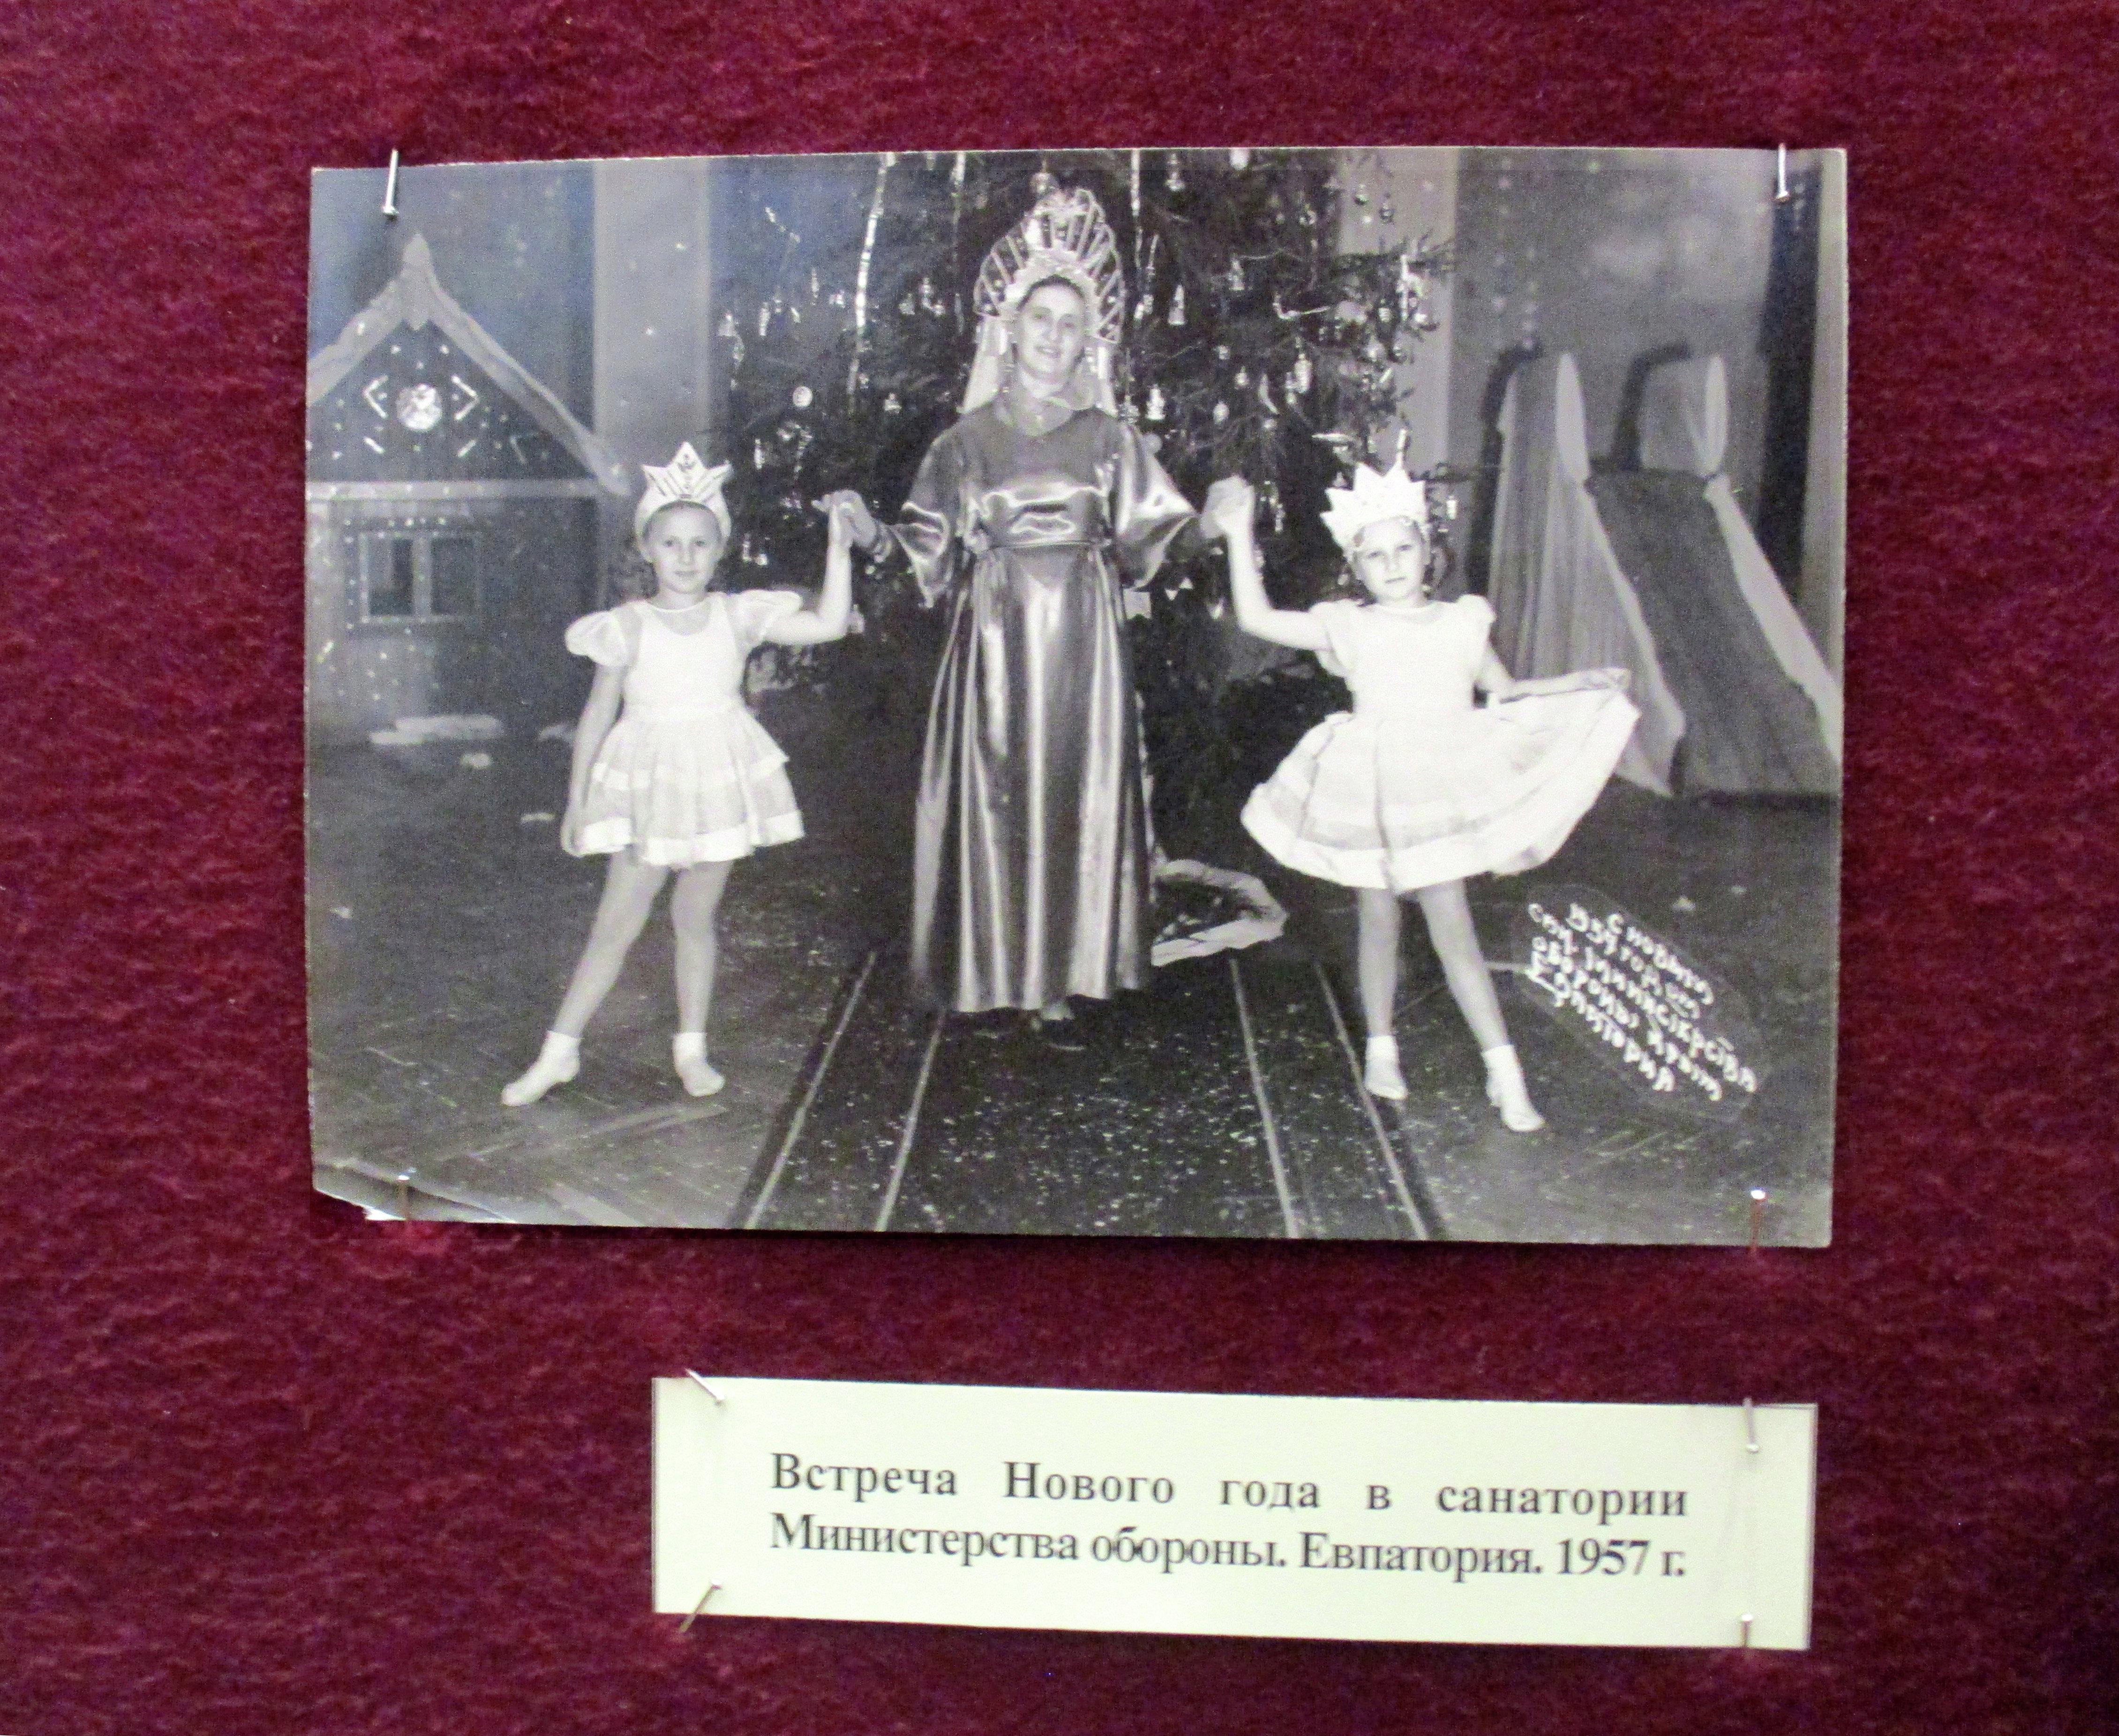 МБДОУ «Детский сад №75» » Юбилей детского сада | 3703x4520